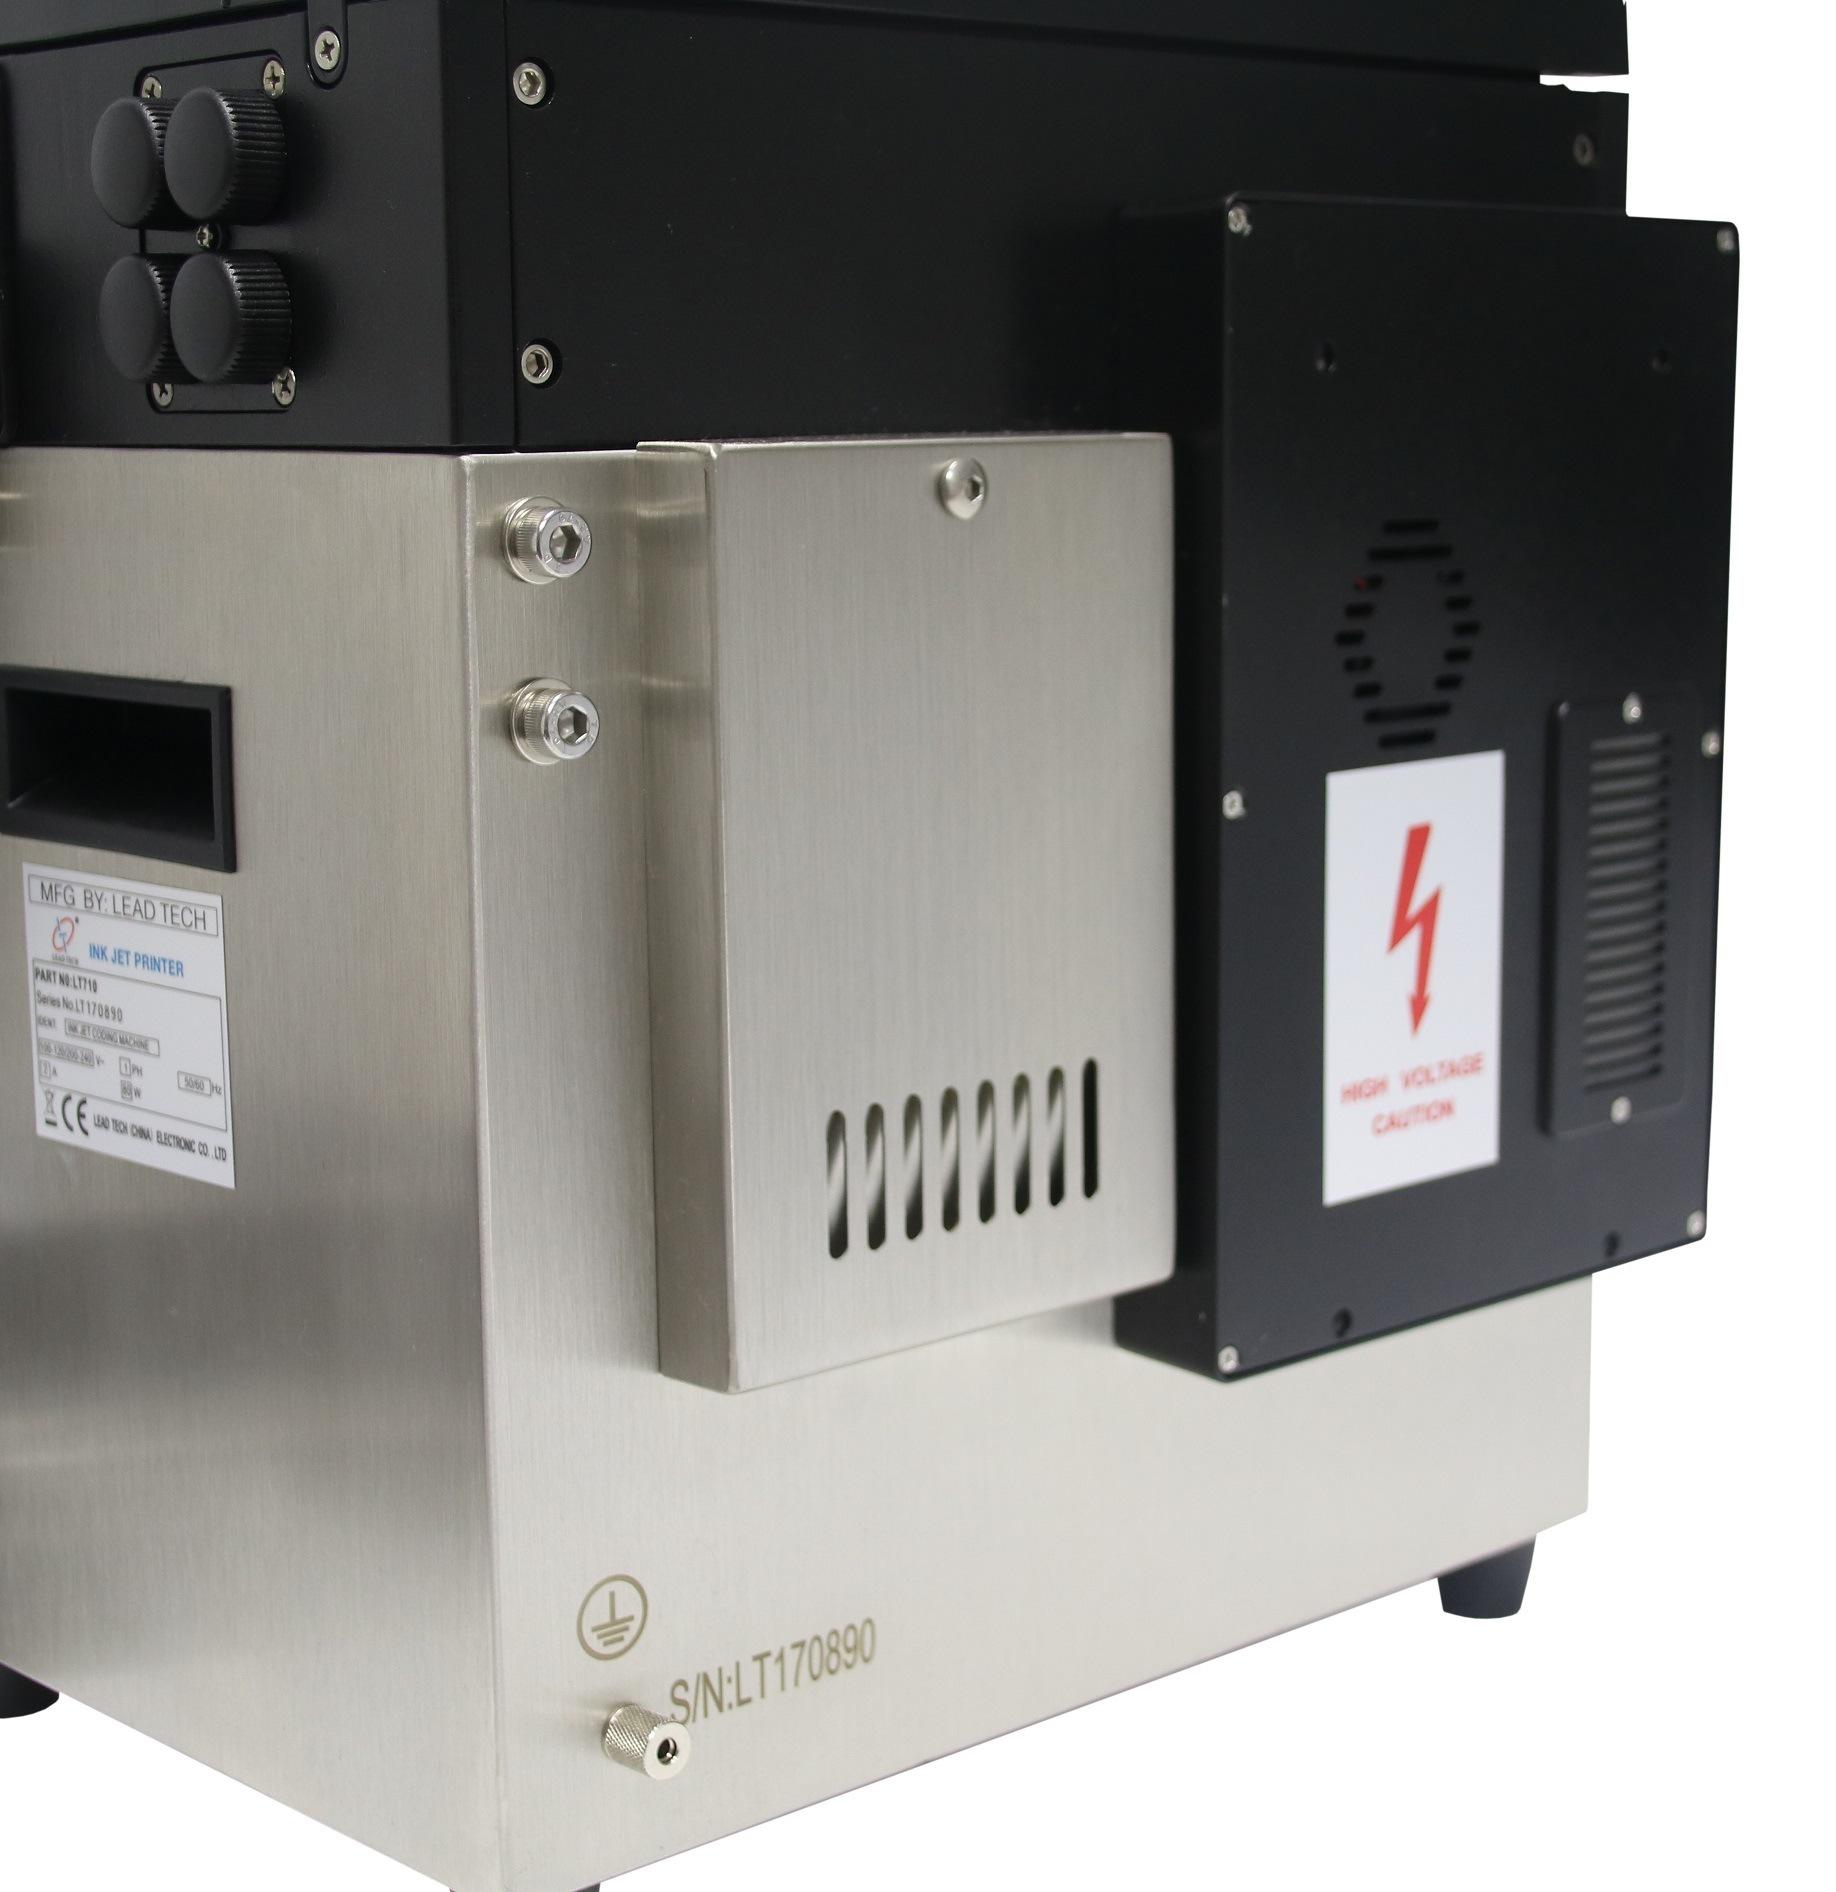 Lead Tech Lt760 Continuous Egg Coding Inkjet Printer